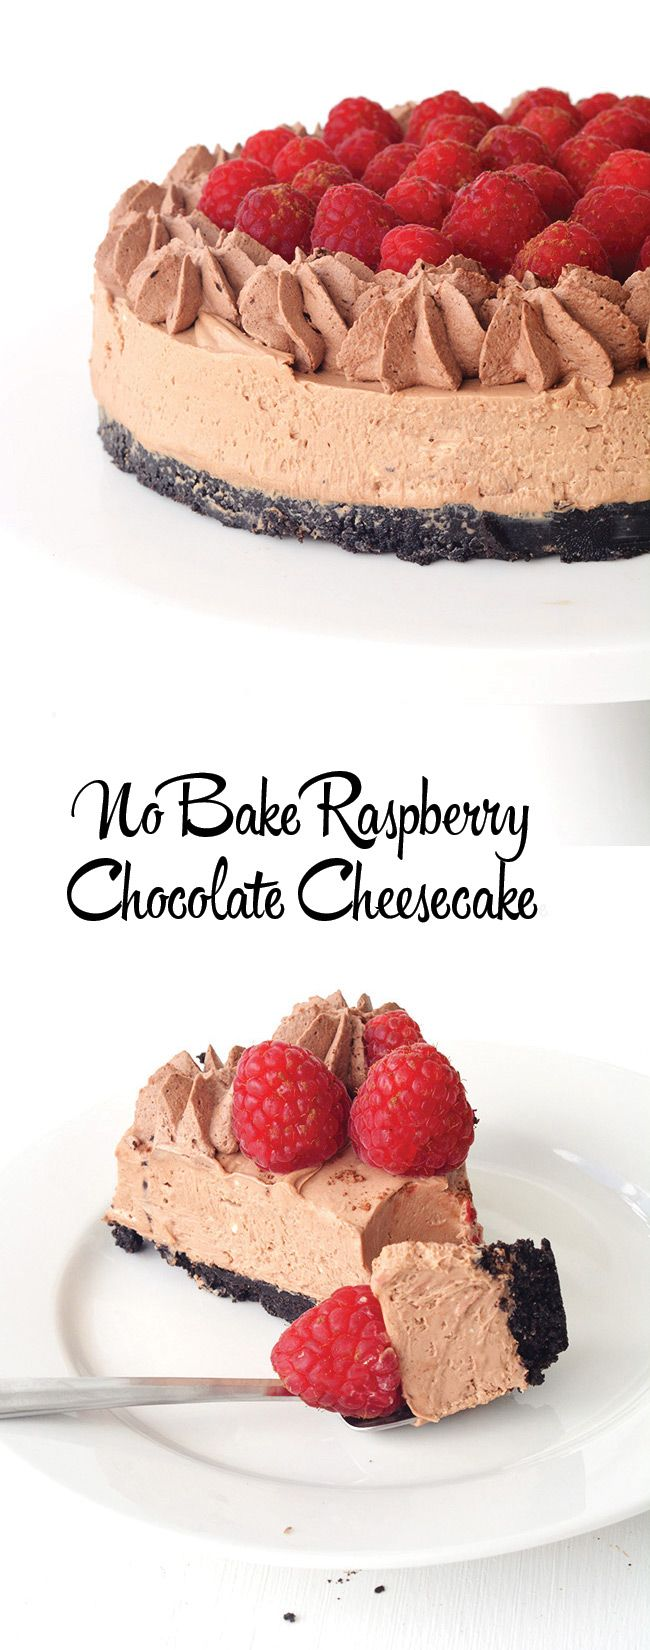 No bake Raspberry Chocolate Cheesecake with an Oreo crust | Sweetest Menu